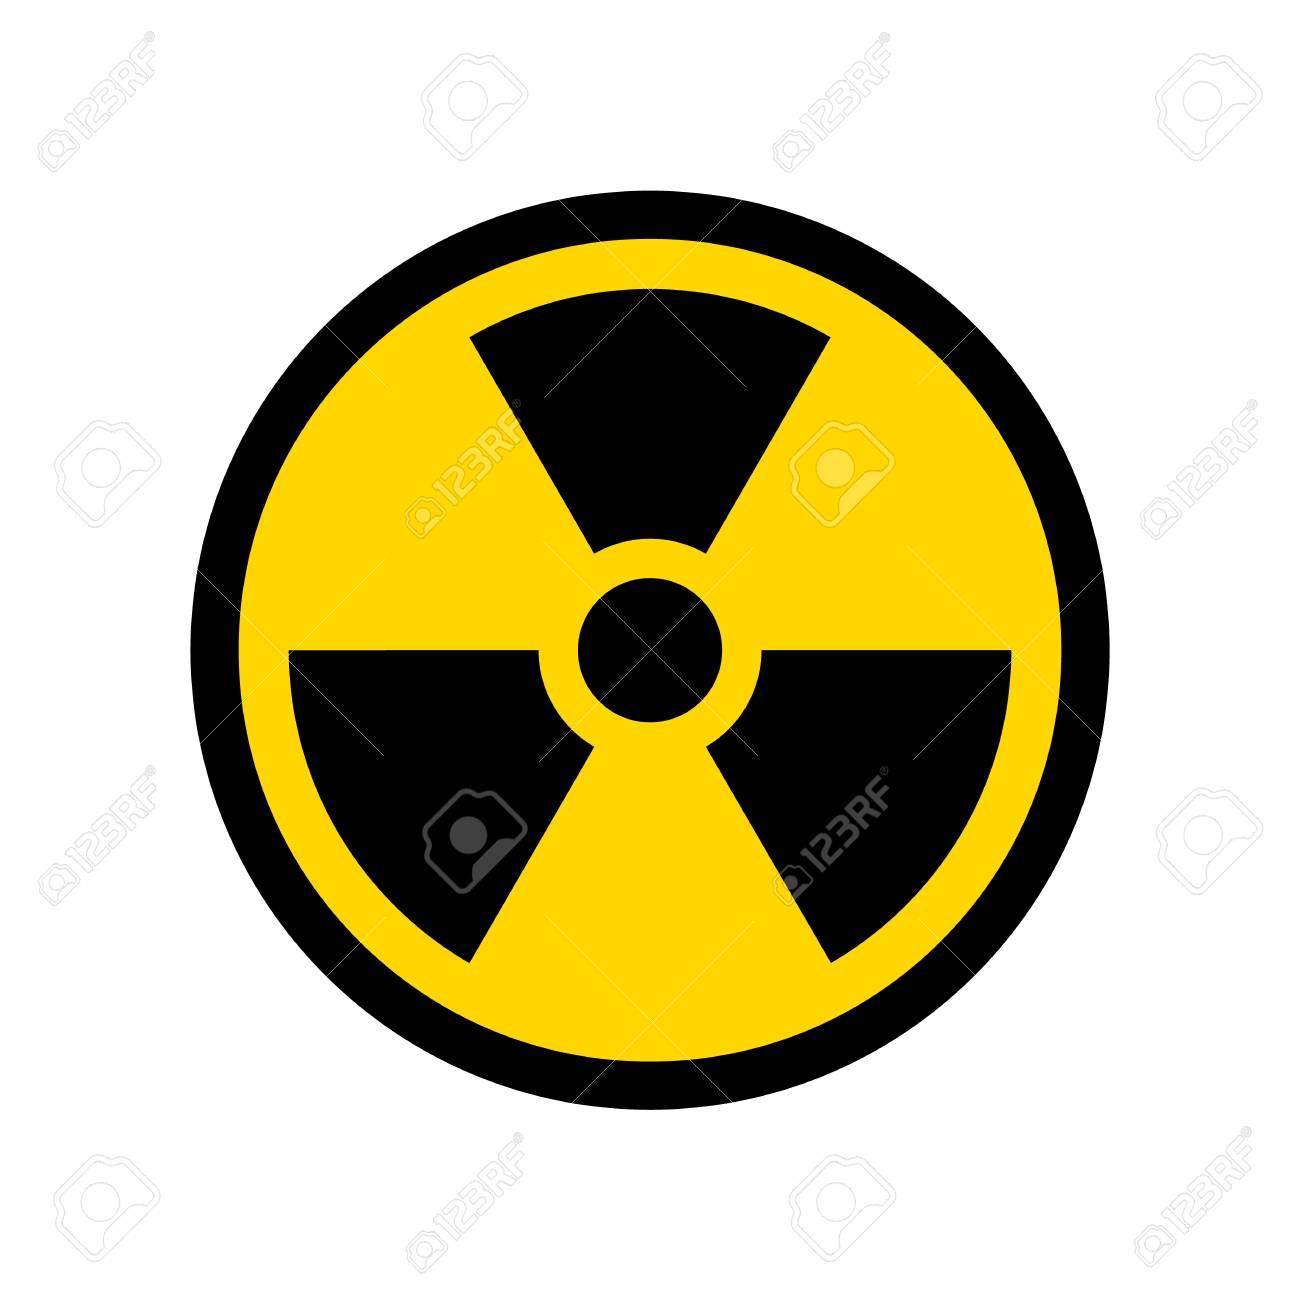 Vector Reproduction of Radioactive symbol simple design icon - 107709598